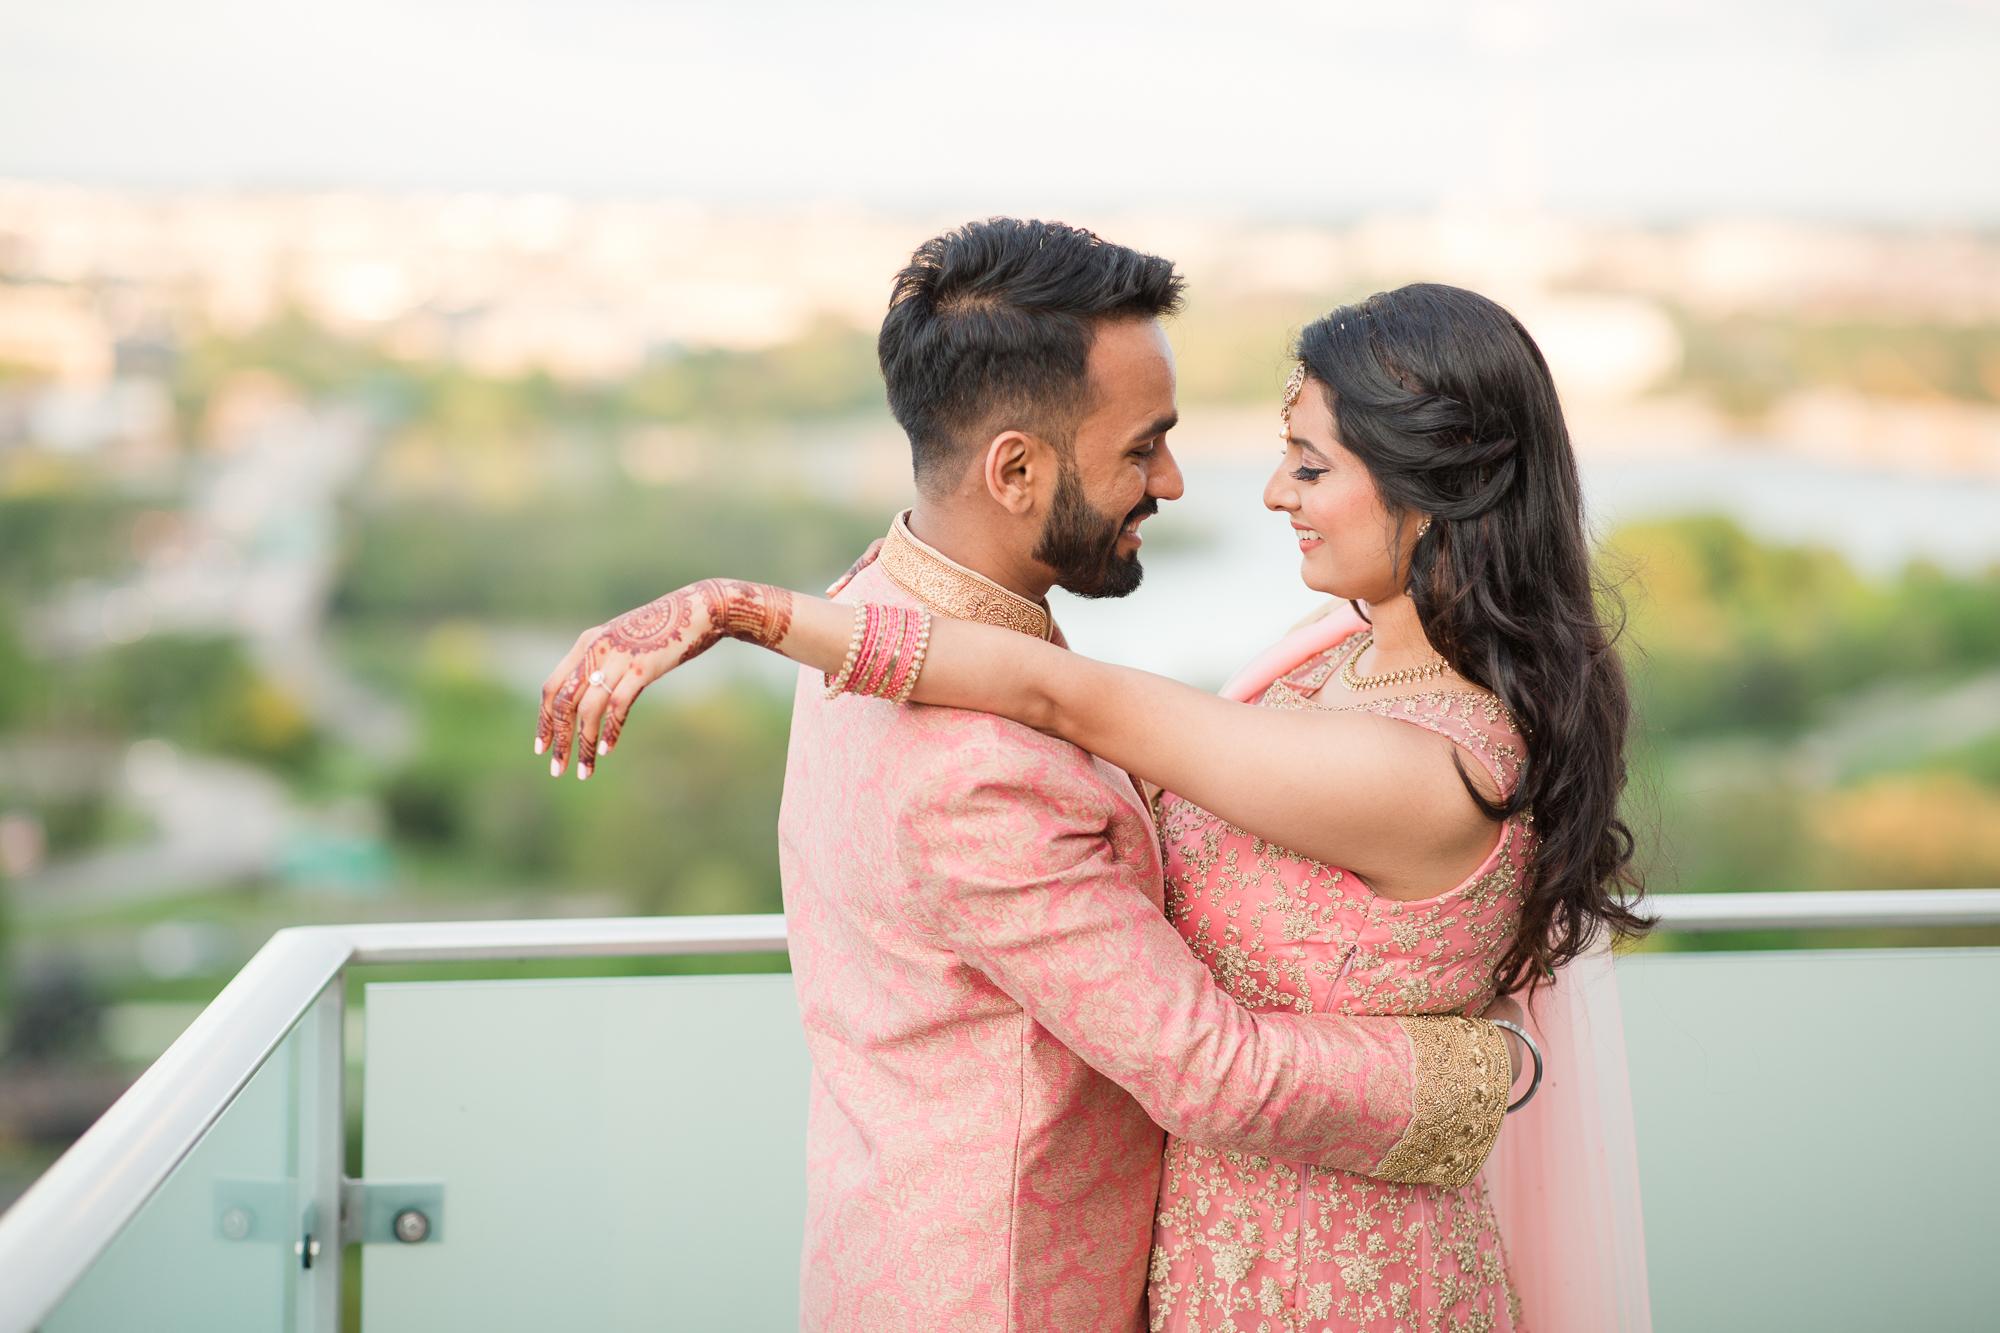 anumeet and gopika, indian engagement ring ceremony, top of the town, alexandria, northern virginia, nova weddings-71.jpg